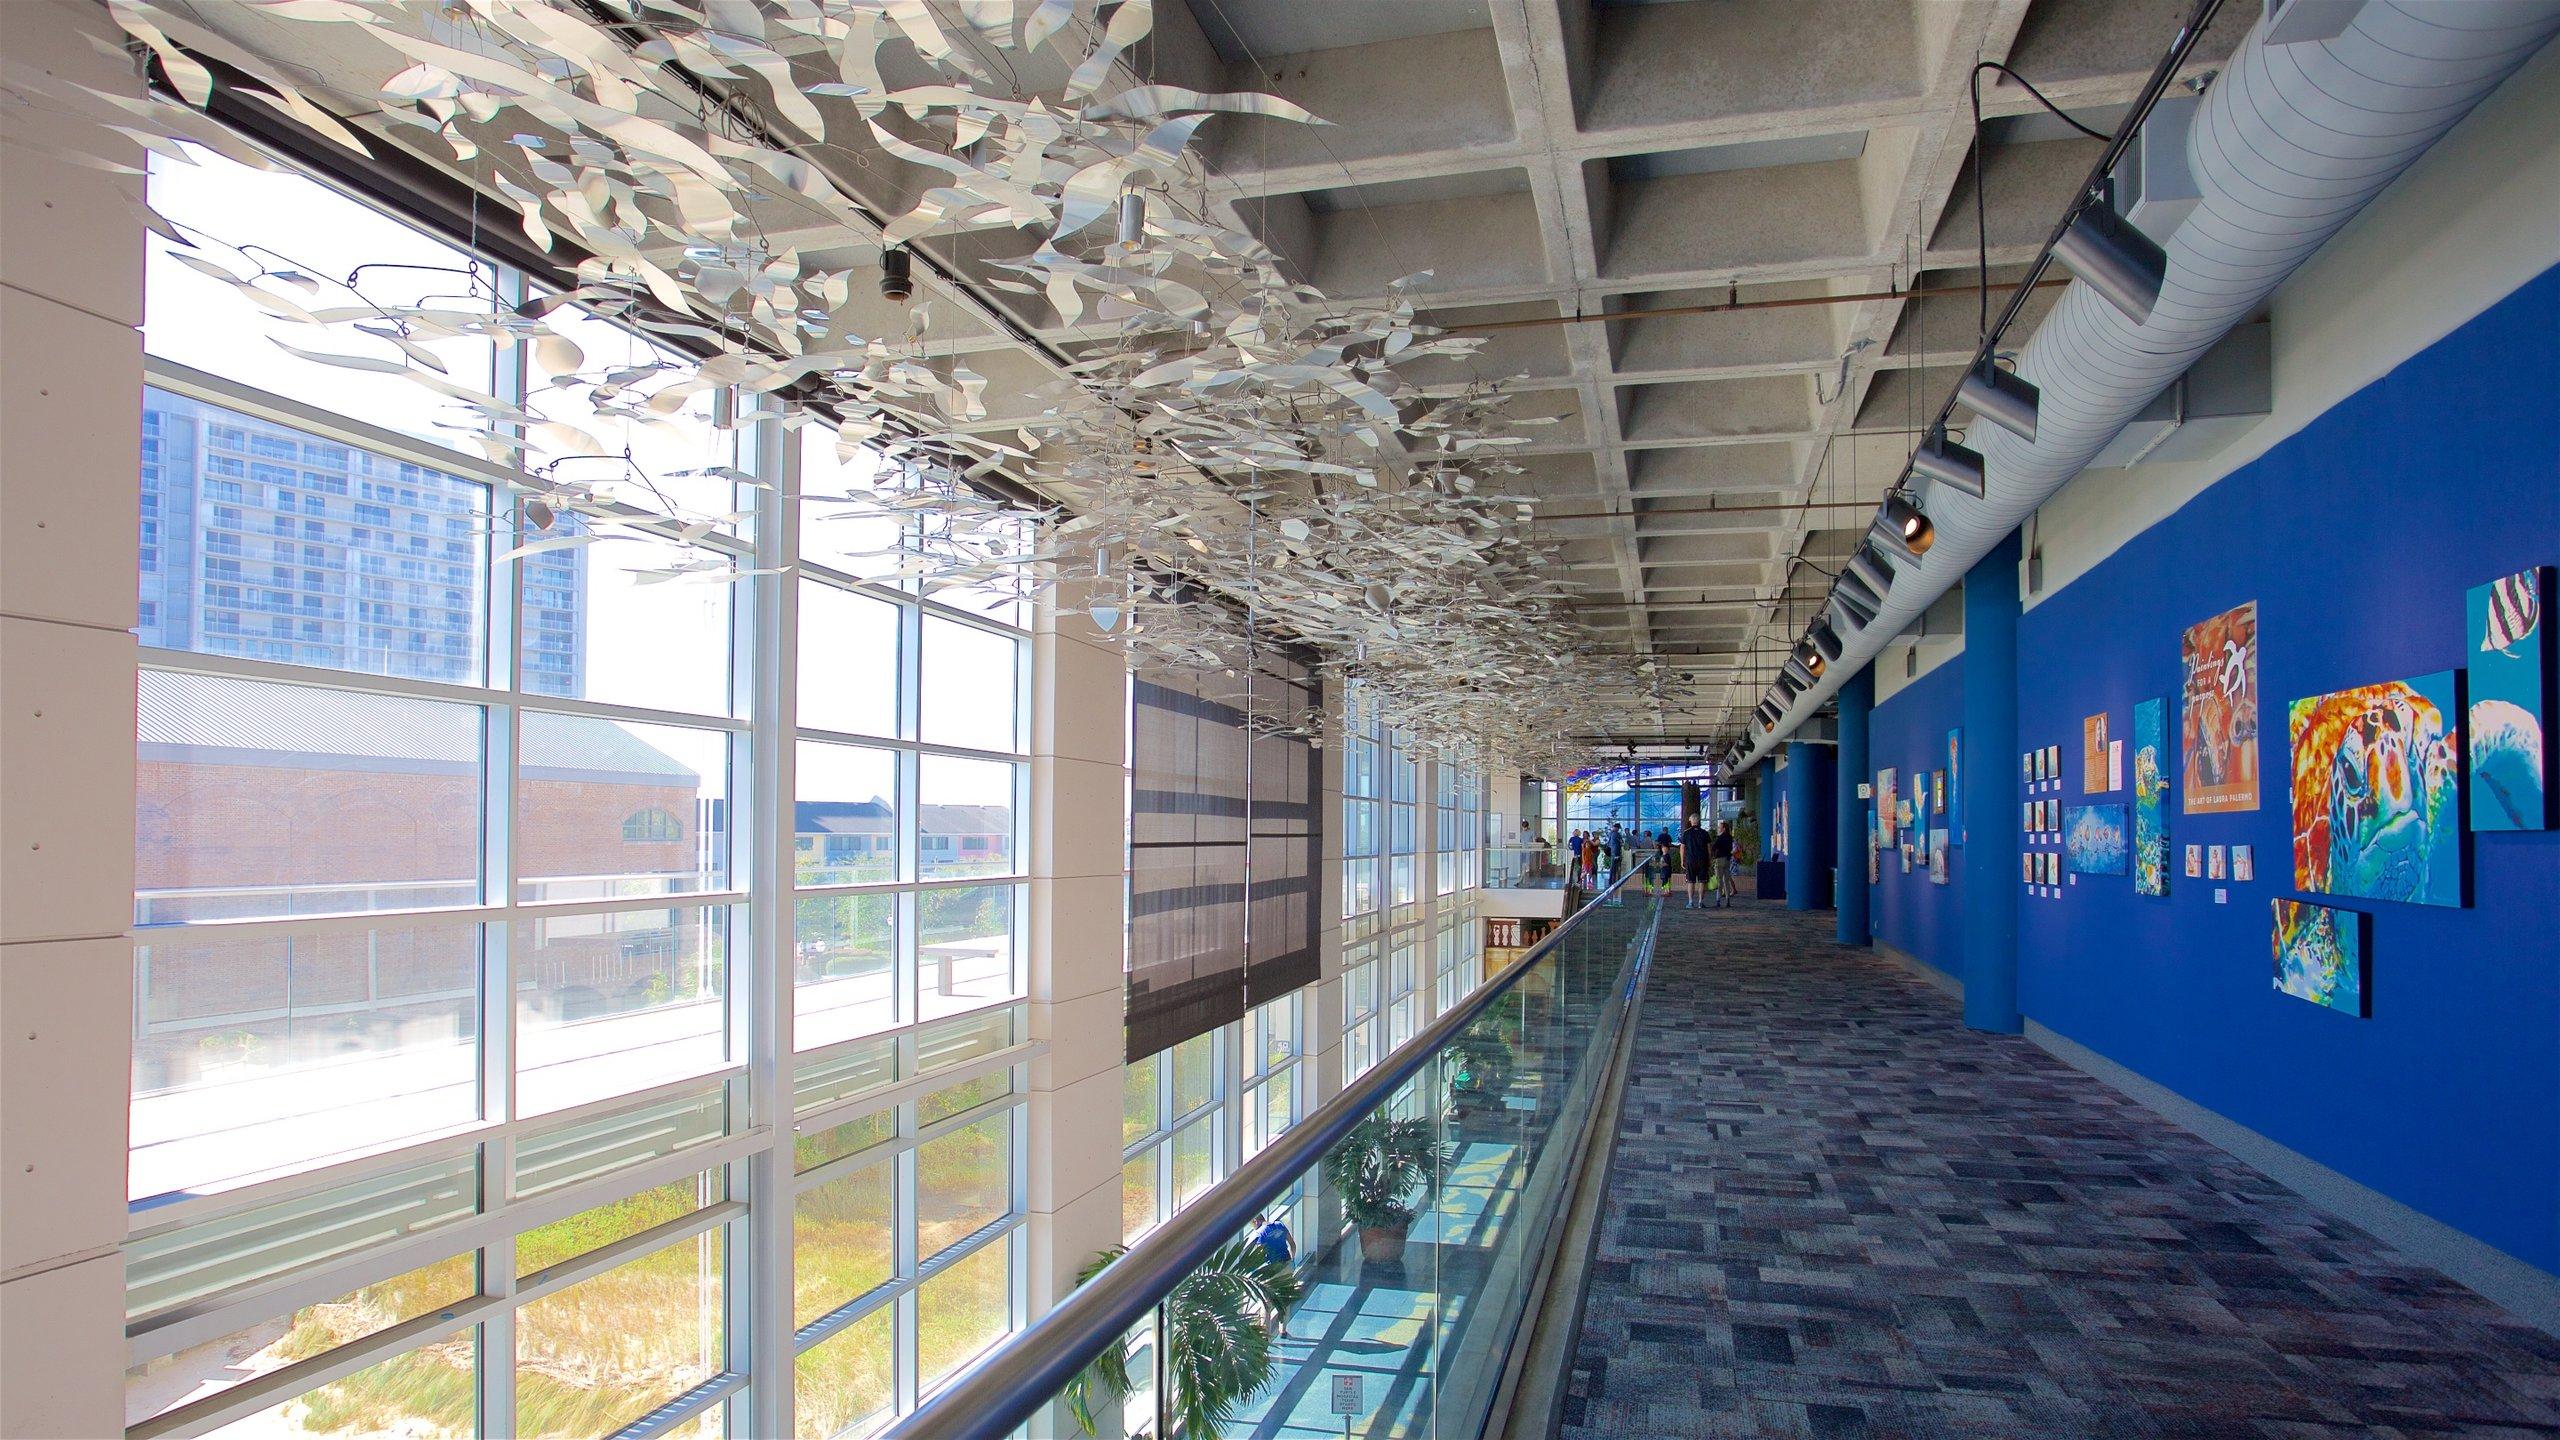 South Carolina Aquarium, Charleston, South Carolina, United States of America